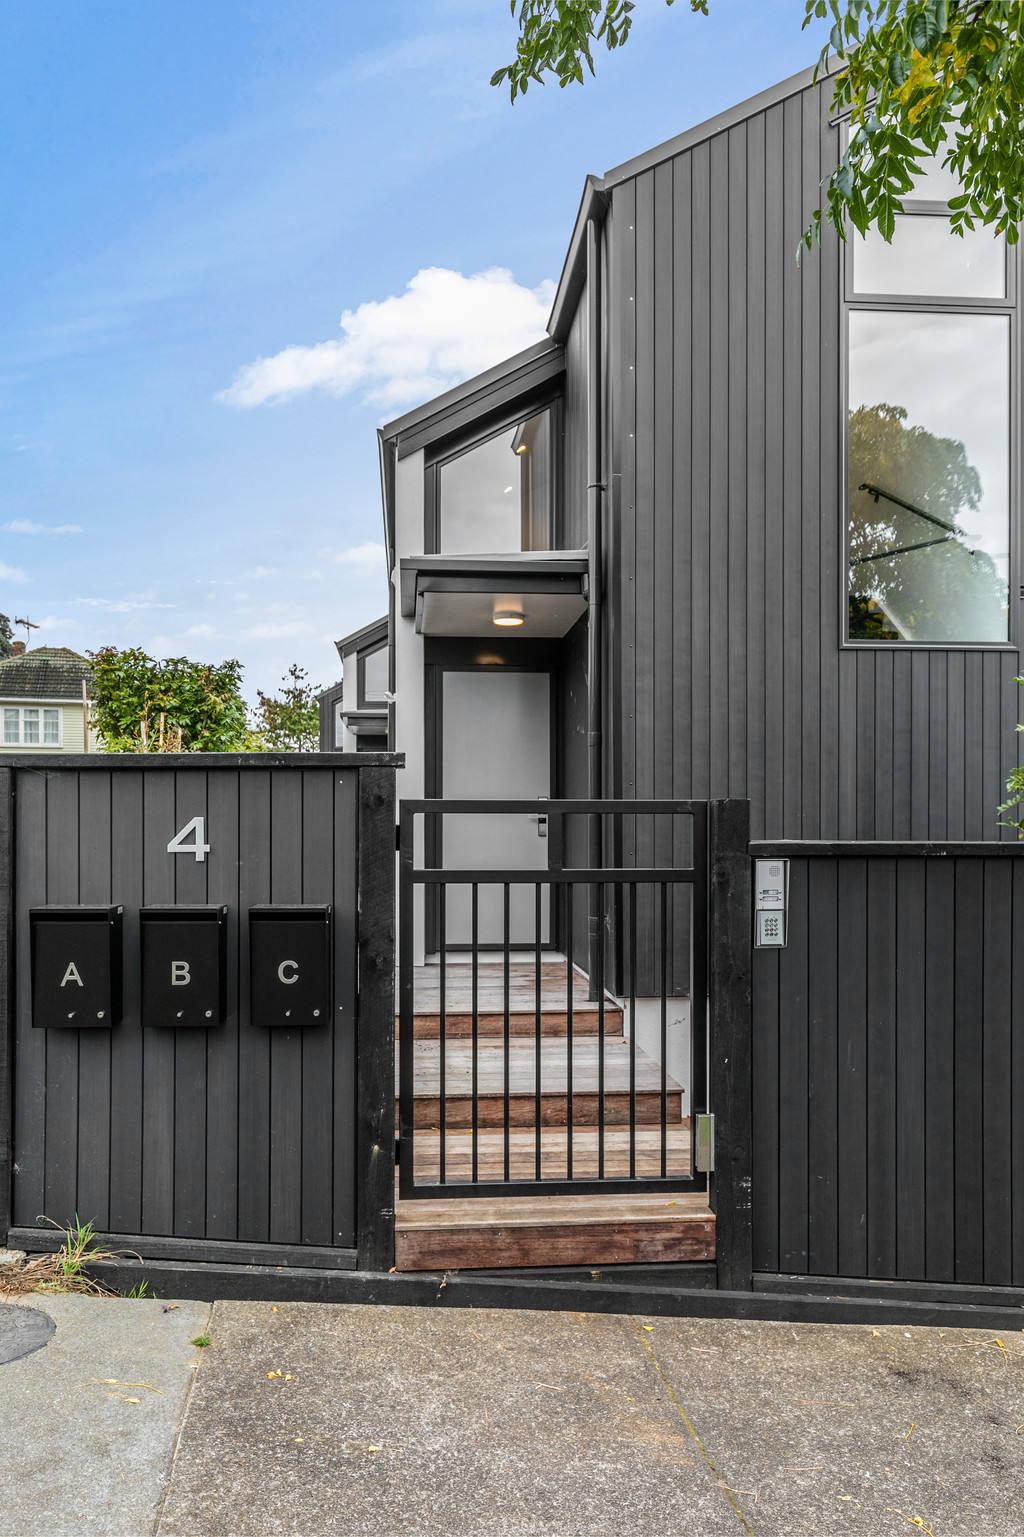 Meadowbank 4房 全新时尚城市屋 名师打造 地段炙手可热 新产权即将下发 专为挑剔买家而生! Brand New Meadowbank Townhouse